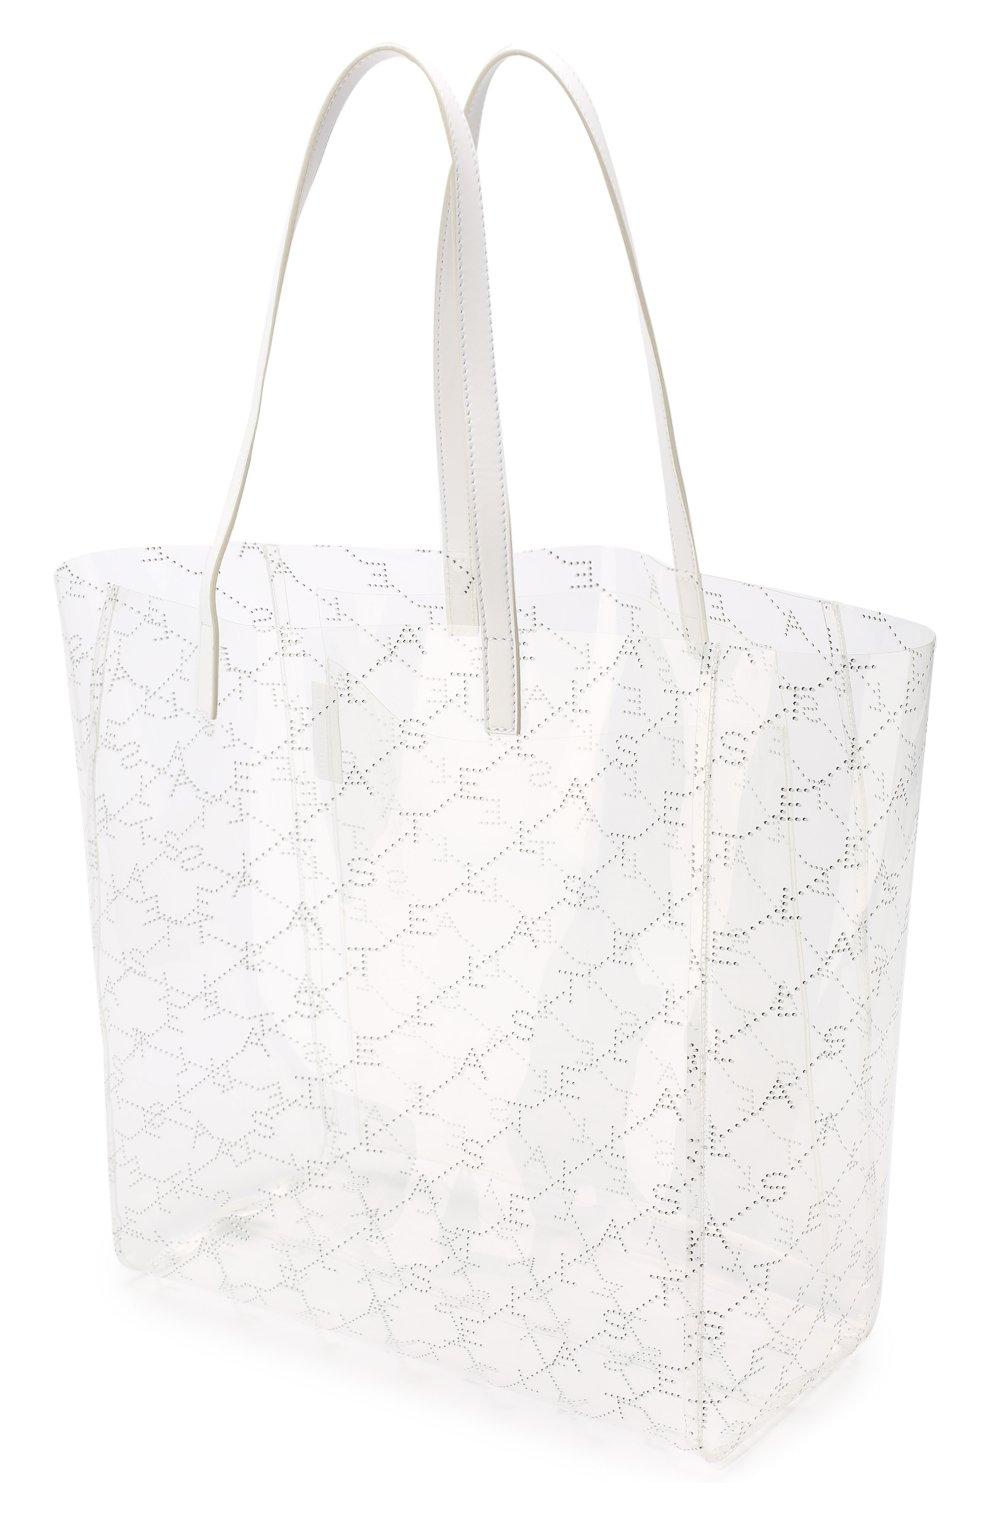 Женская сумка-тоут monogram  STELLA MCCARTNEY прозрачного цвета, арт. 541619/W8464 | Фото 4